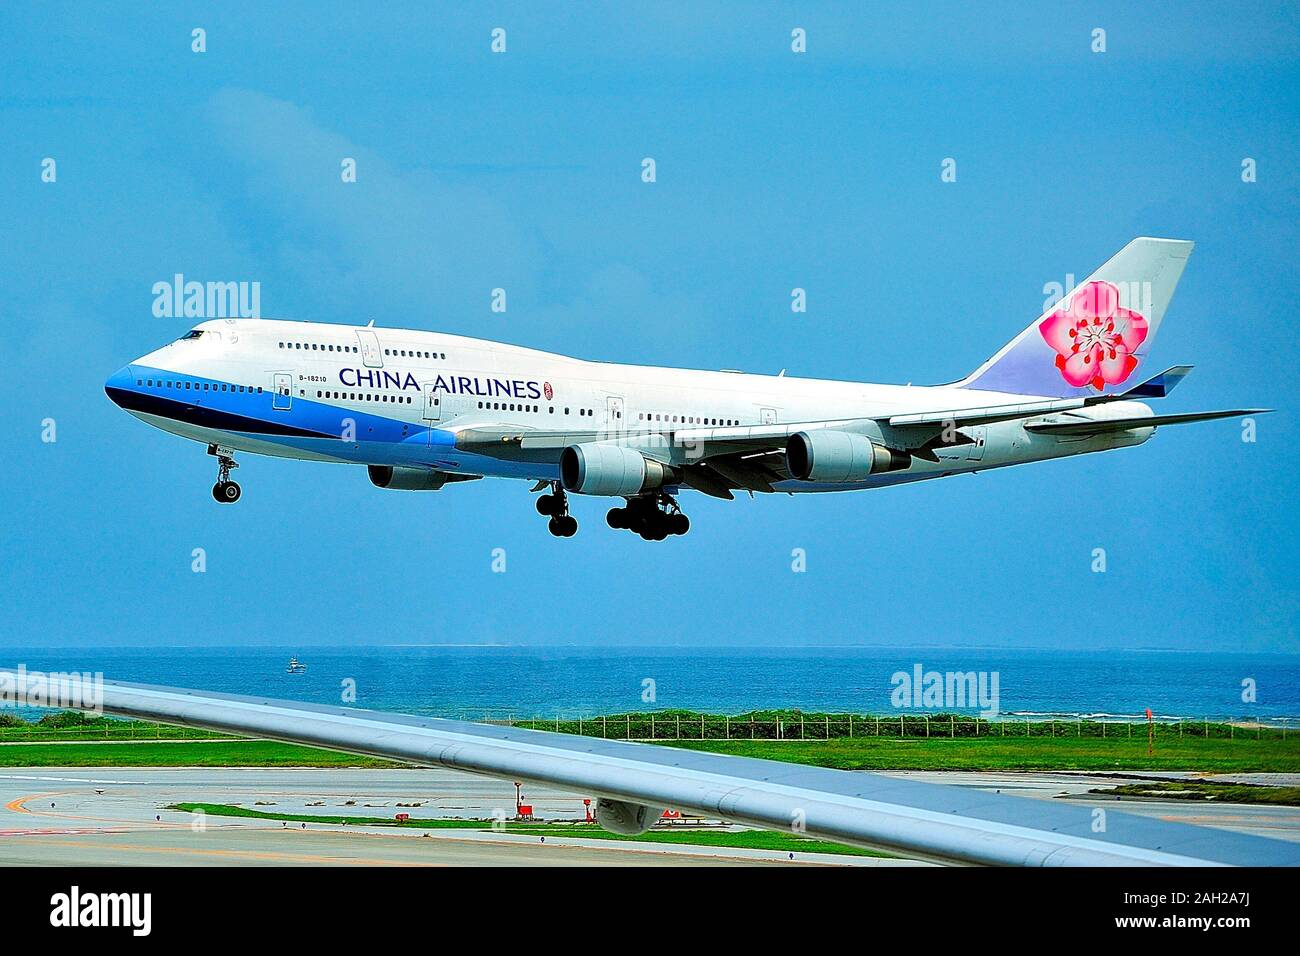 China Airlines Boeing B-747-400, B-18210, atterrando all'Aeroporto di Naha, Okinawa, in Giappone Foto Stock